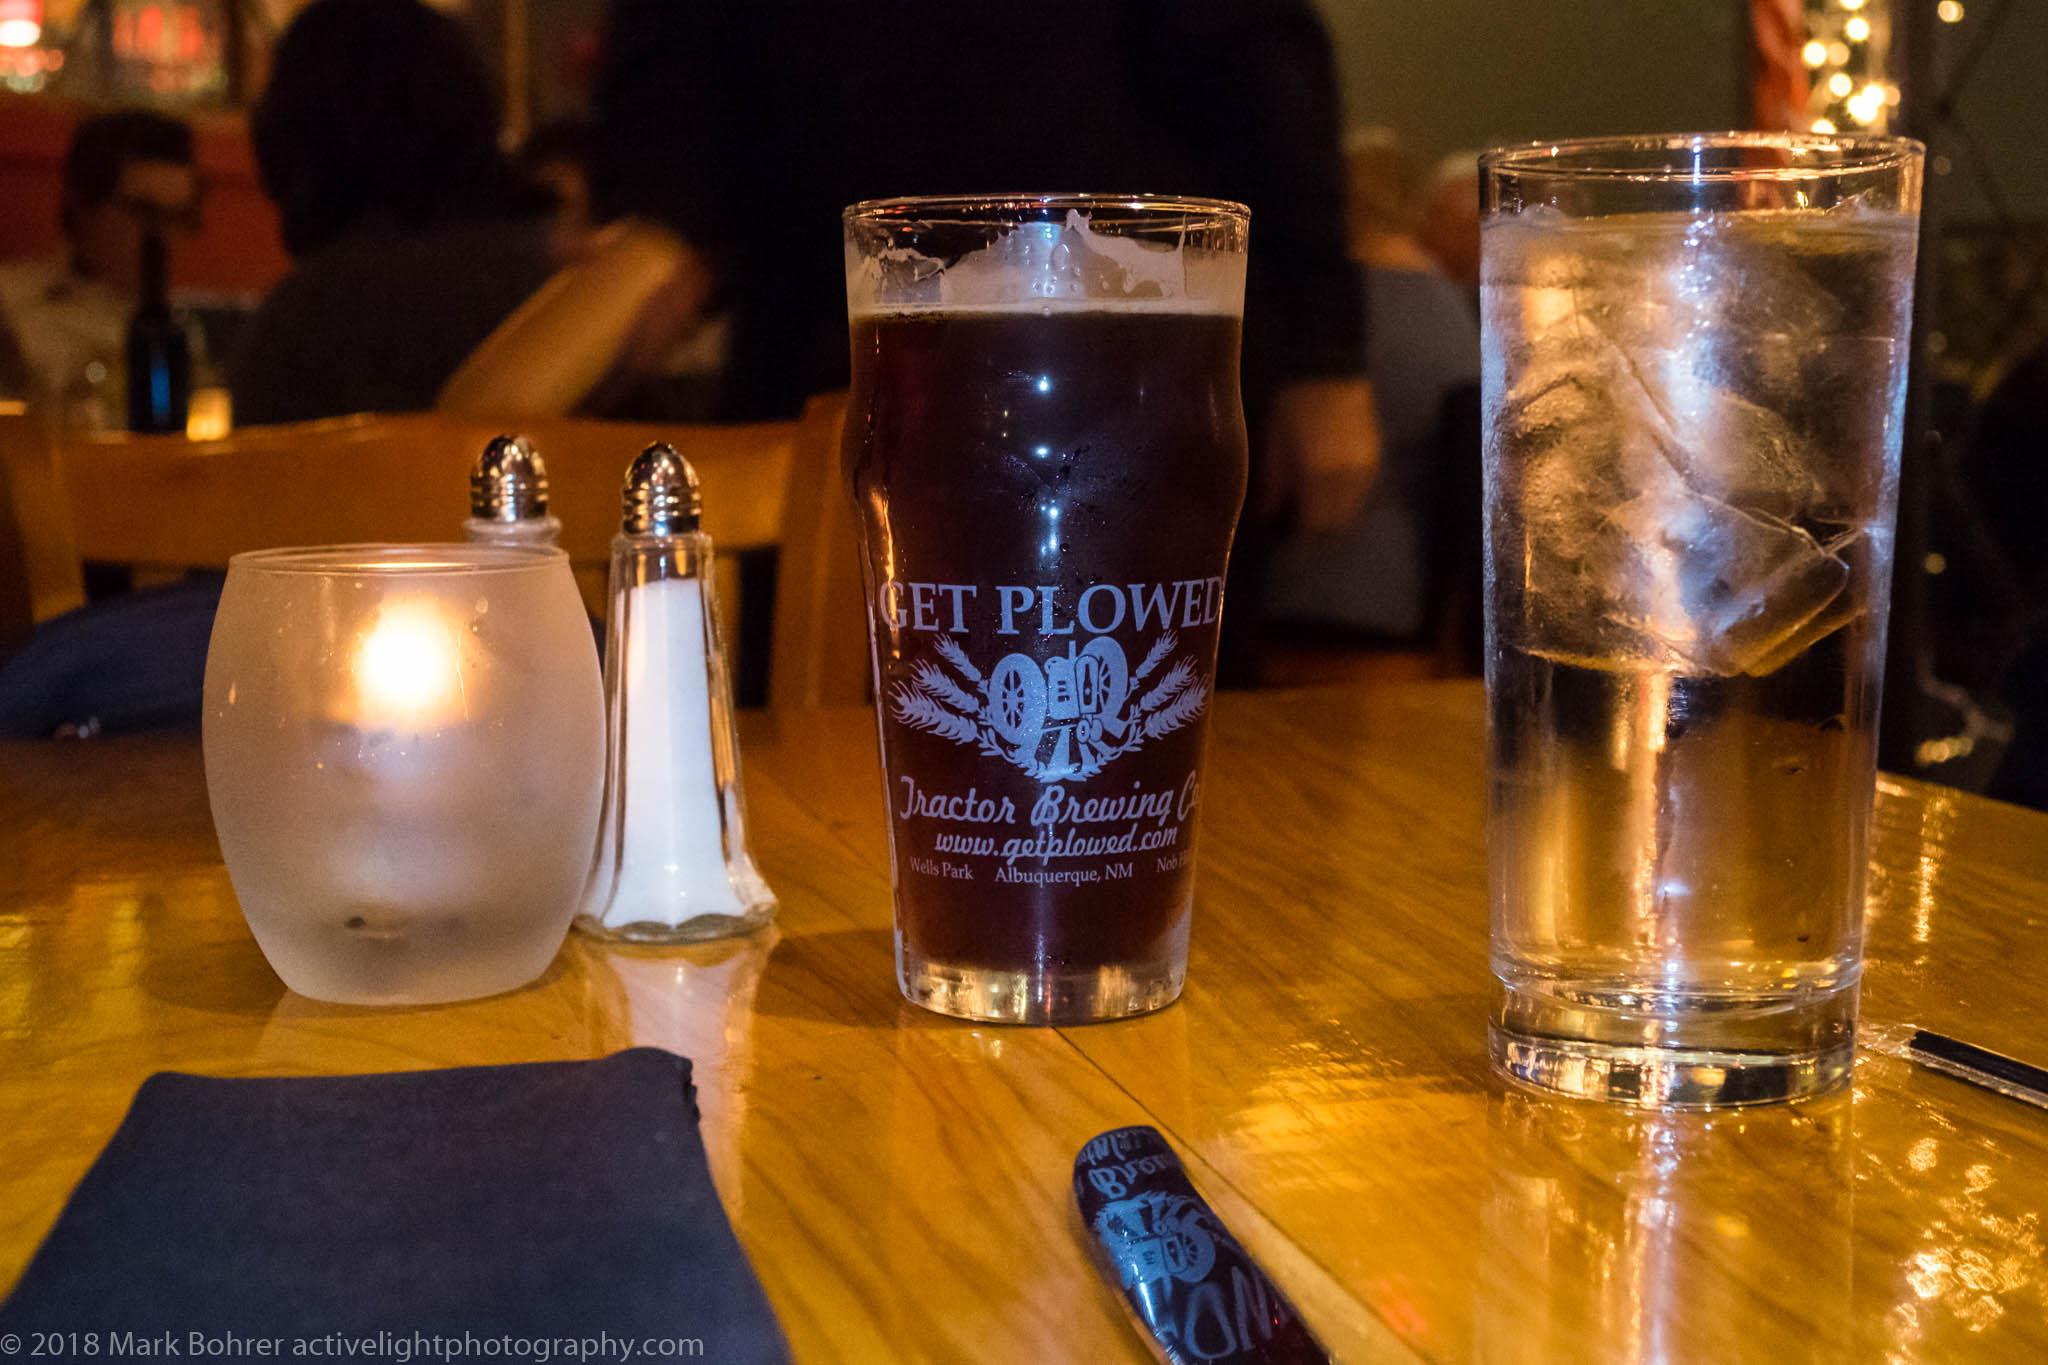 Get Ploughed - La Cumbre Pumpkin Ale at the Range Cafe, Albuquerque